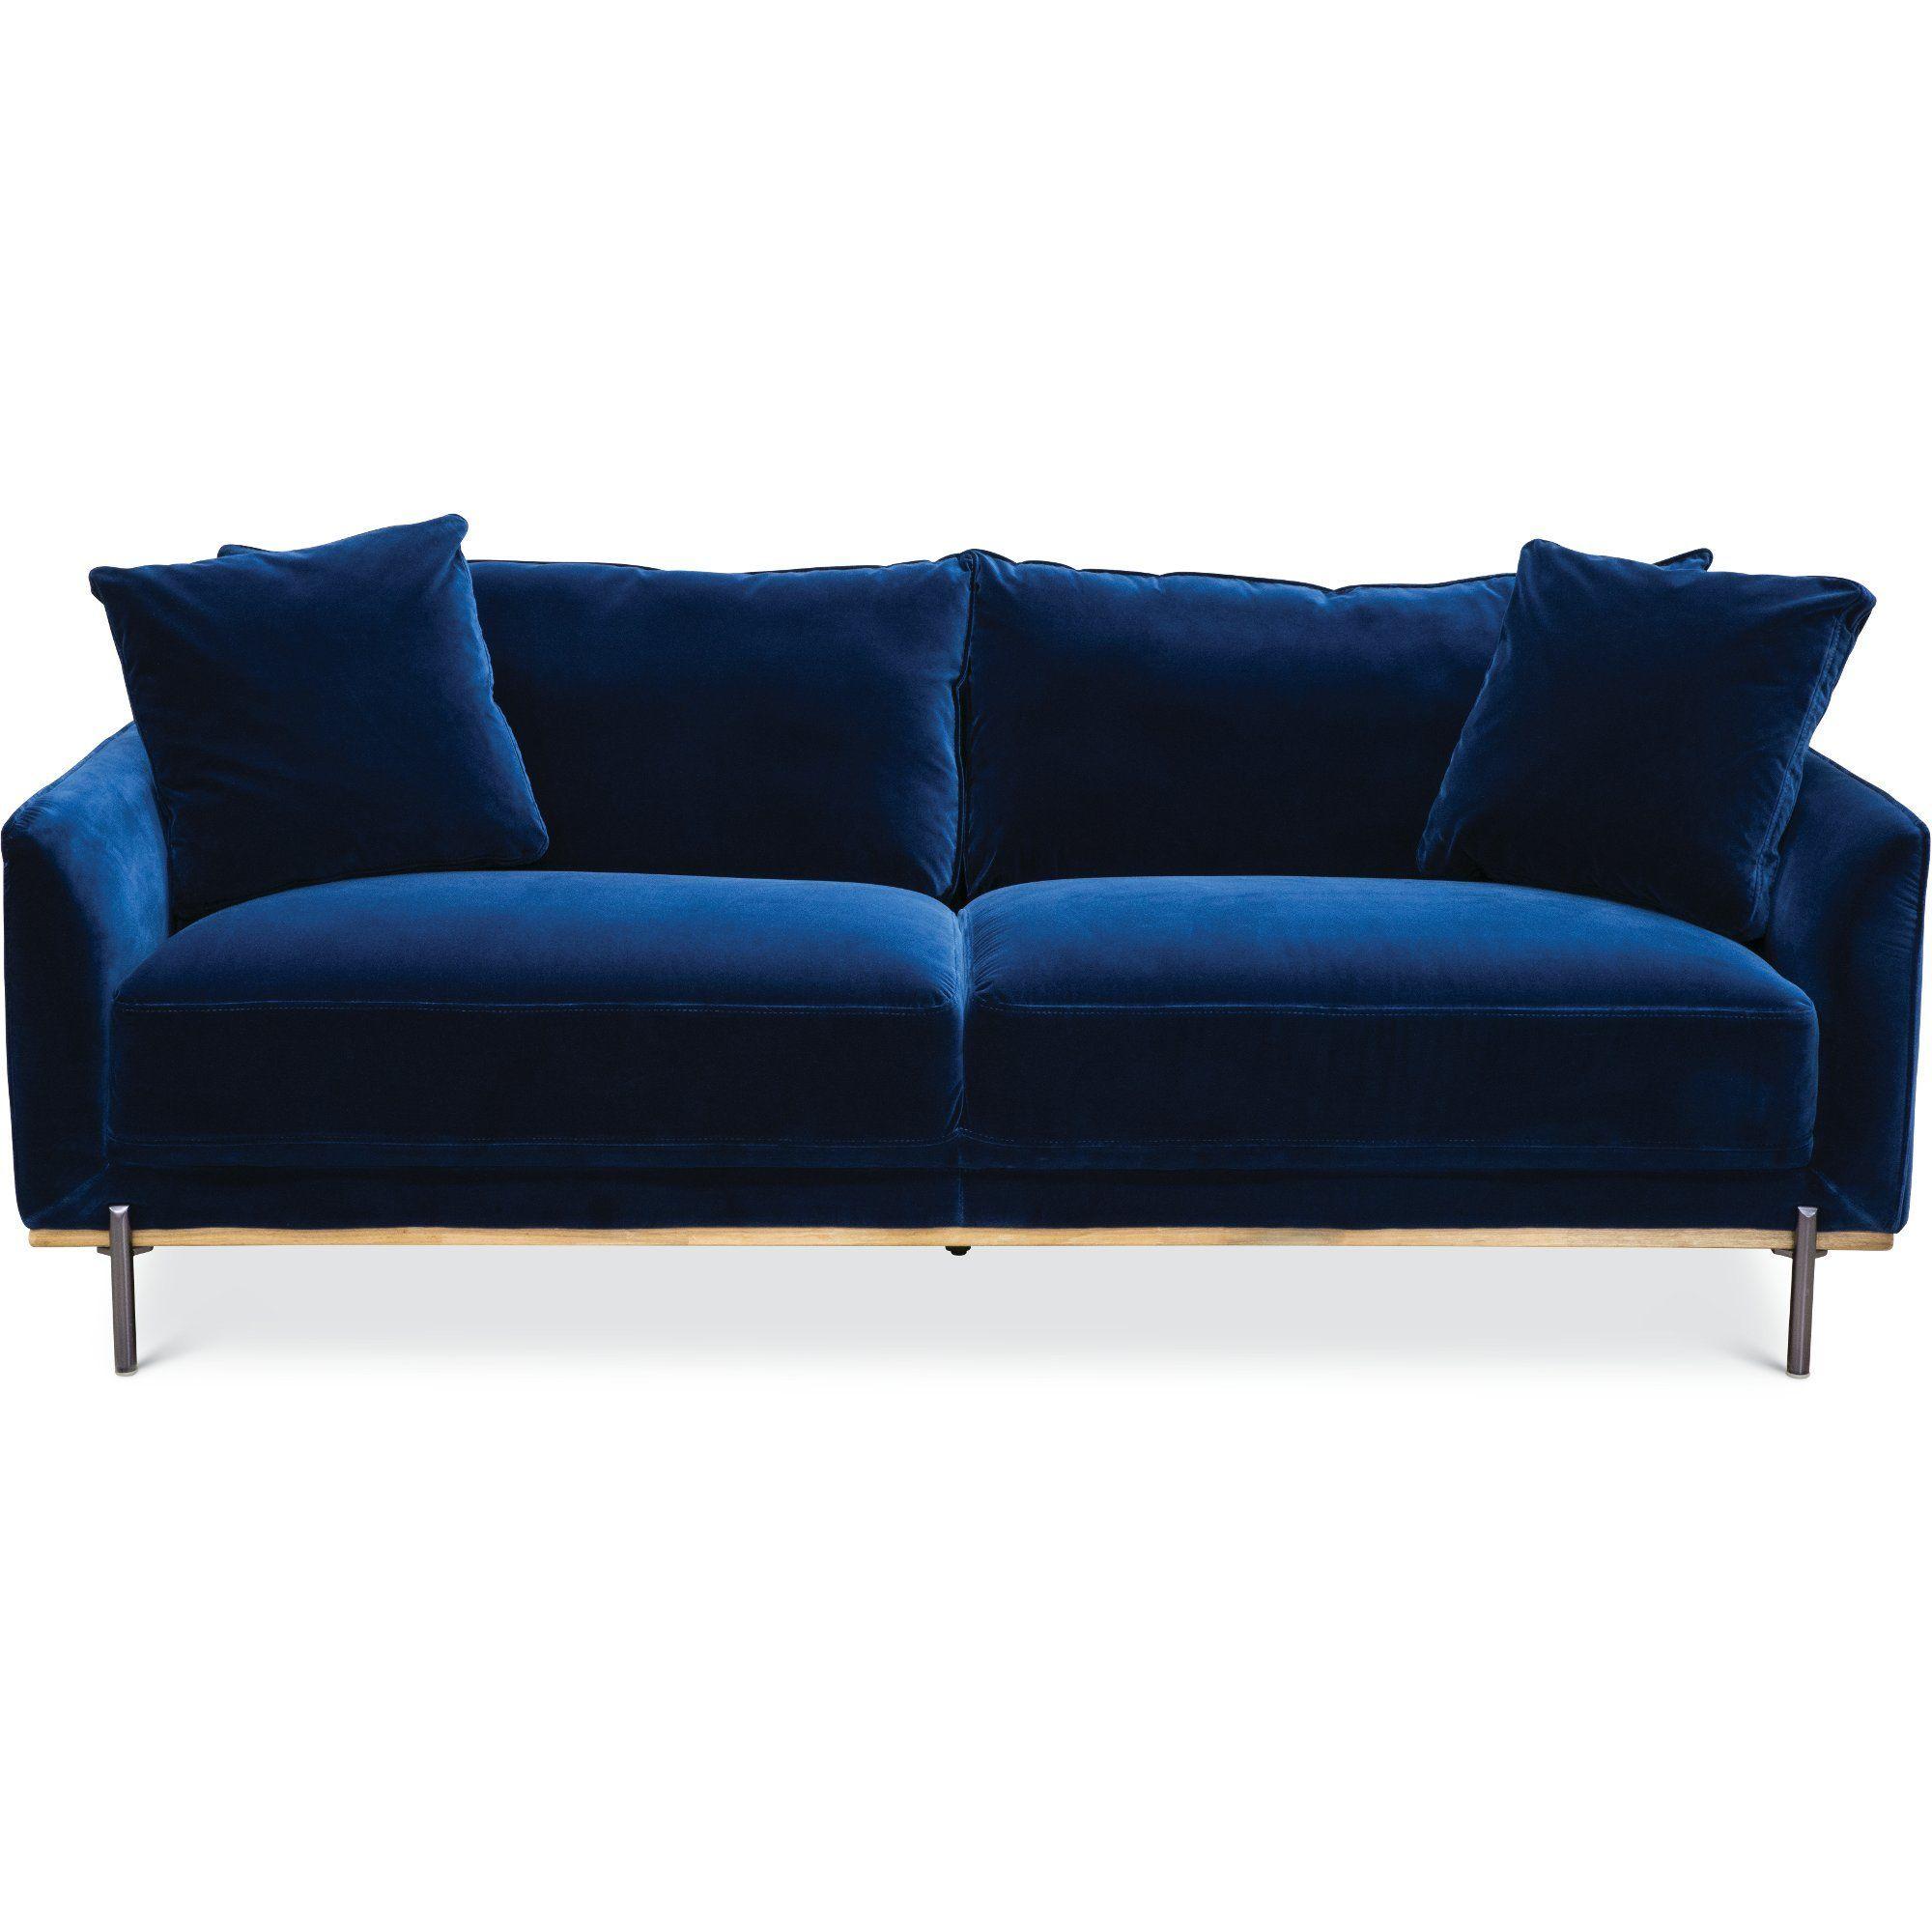 Surprising Modern Royal Blue Velvet Sofa Marseille Rcwilley Com Beatyapartments Chair Design Images Beatyapartmentscom